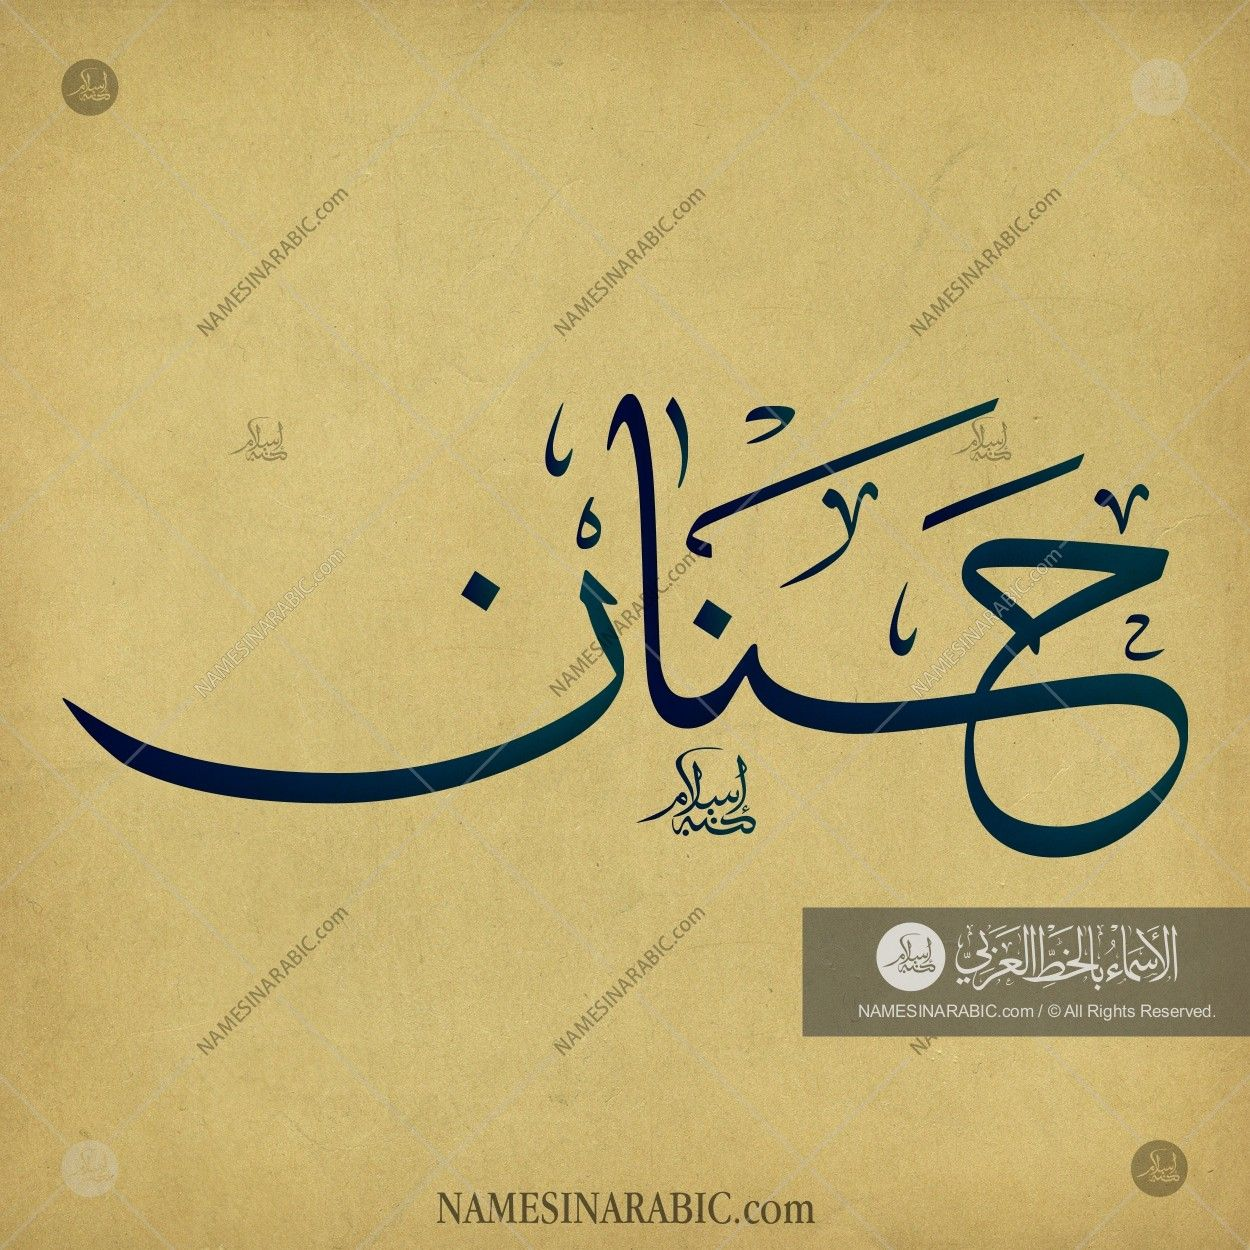 Hanan حنان Names In Arabic Calligraphy Name 3330 Calligraphy Name Calligraphy Arabic Calligraphy